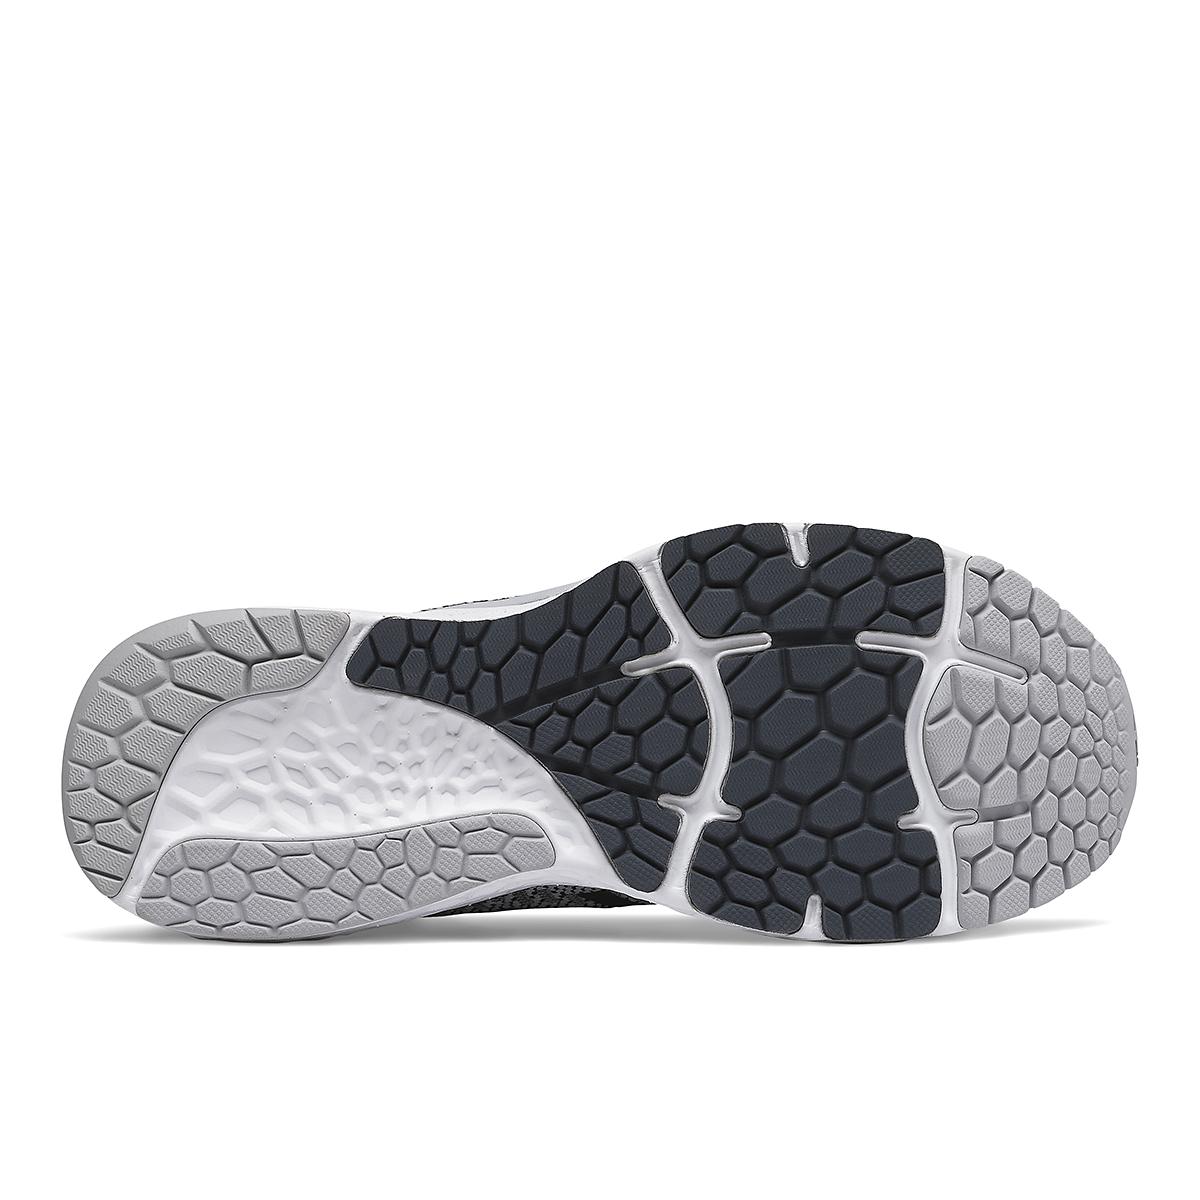 Men's New Balance 880V10 Running Shoe - Color: Light Aluminum - Size: 7 - Width: Wide, Light Aluminum, large, image 4